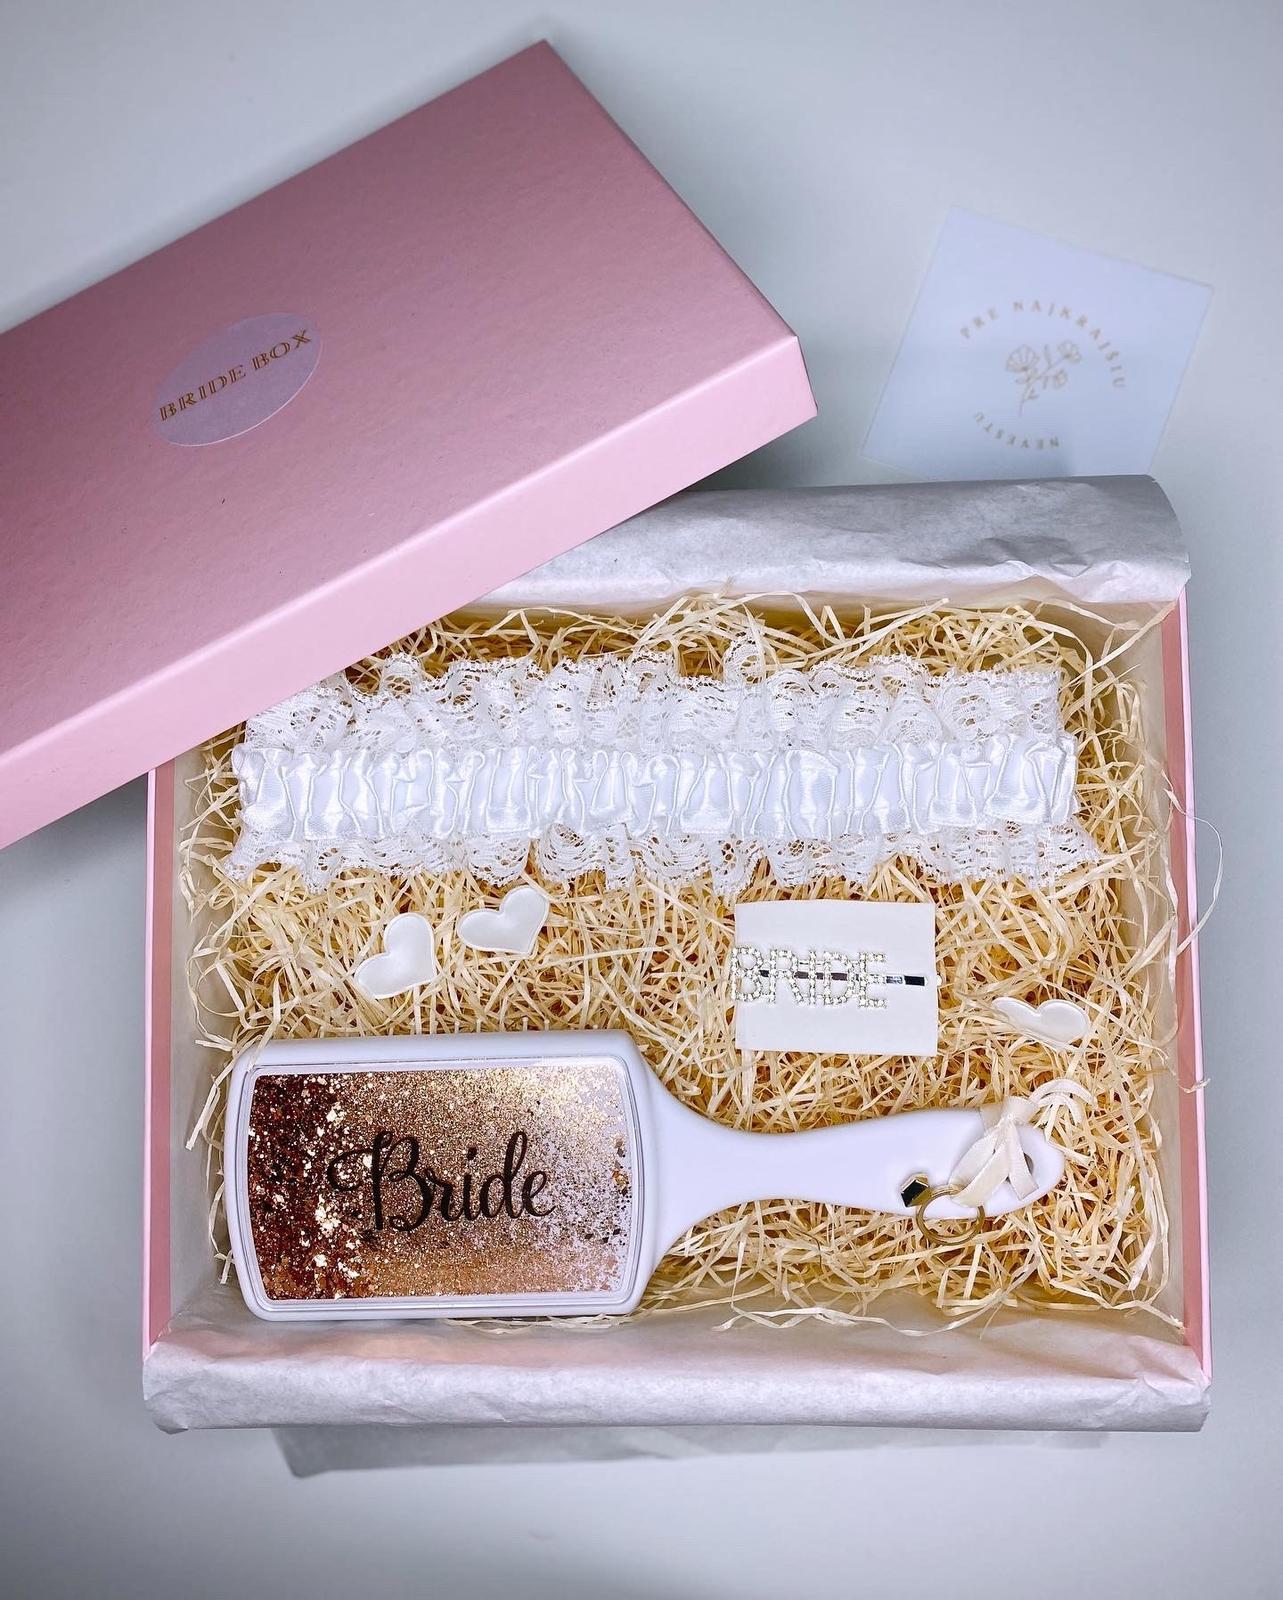 Bride box/ box pre nevestu - Obrázek č. 1